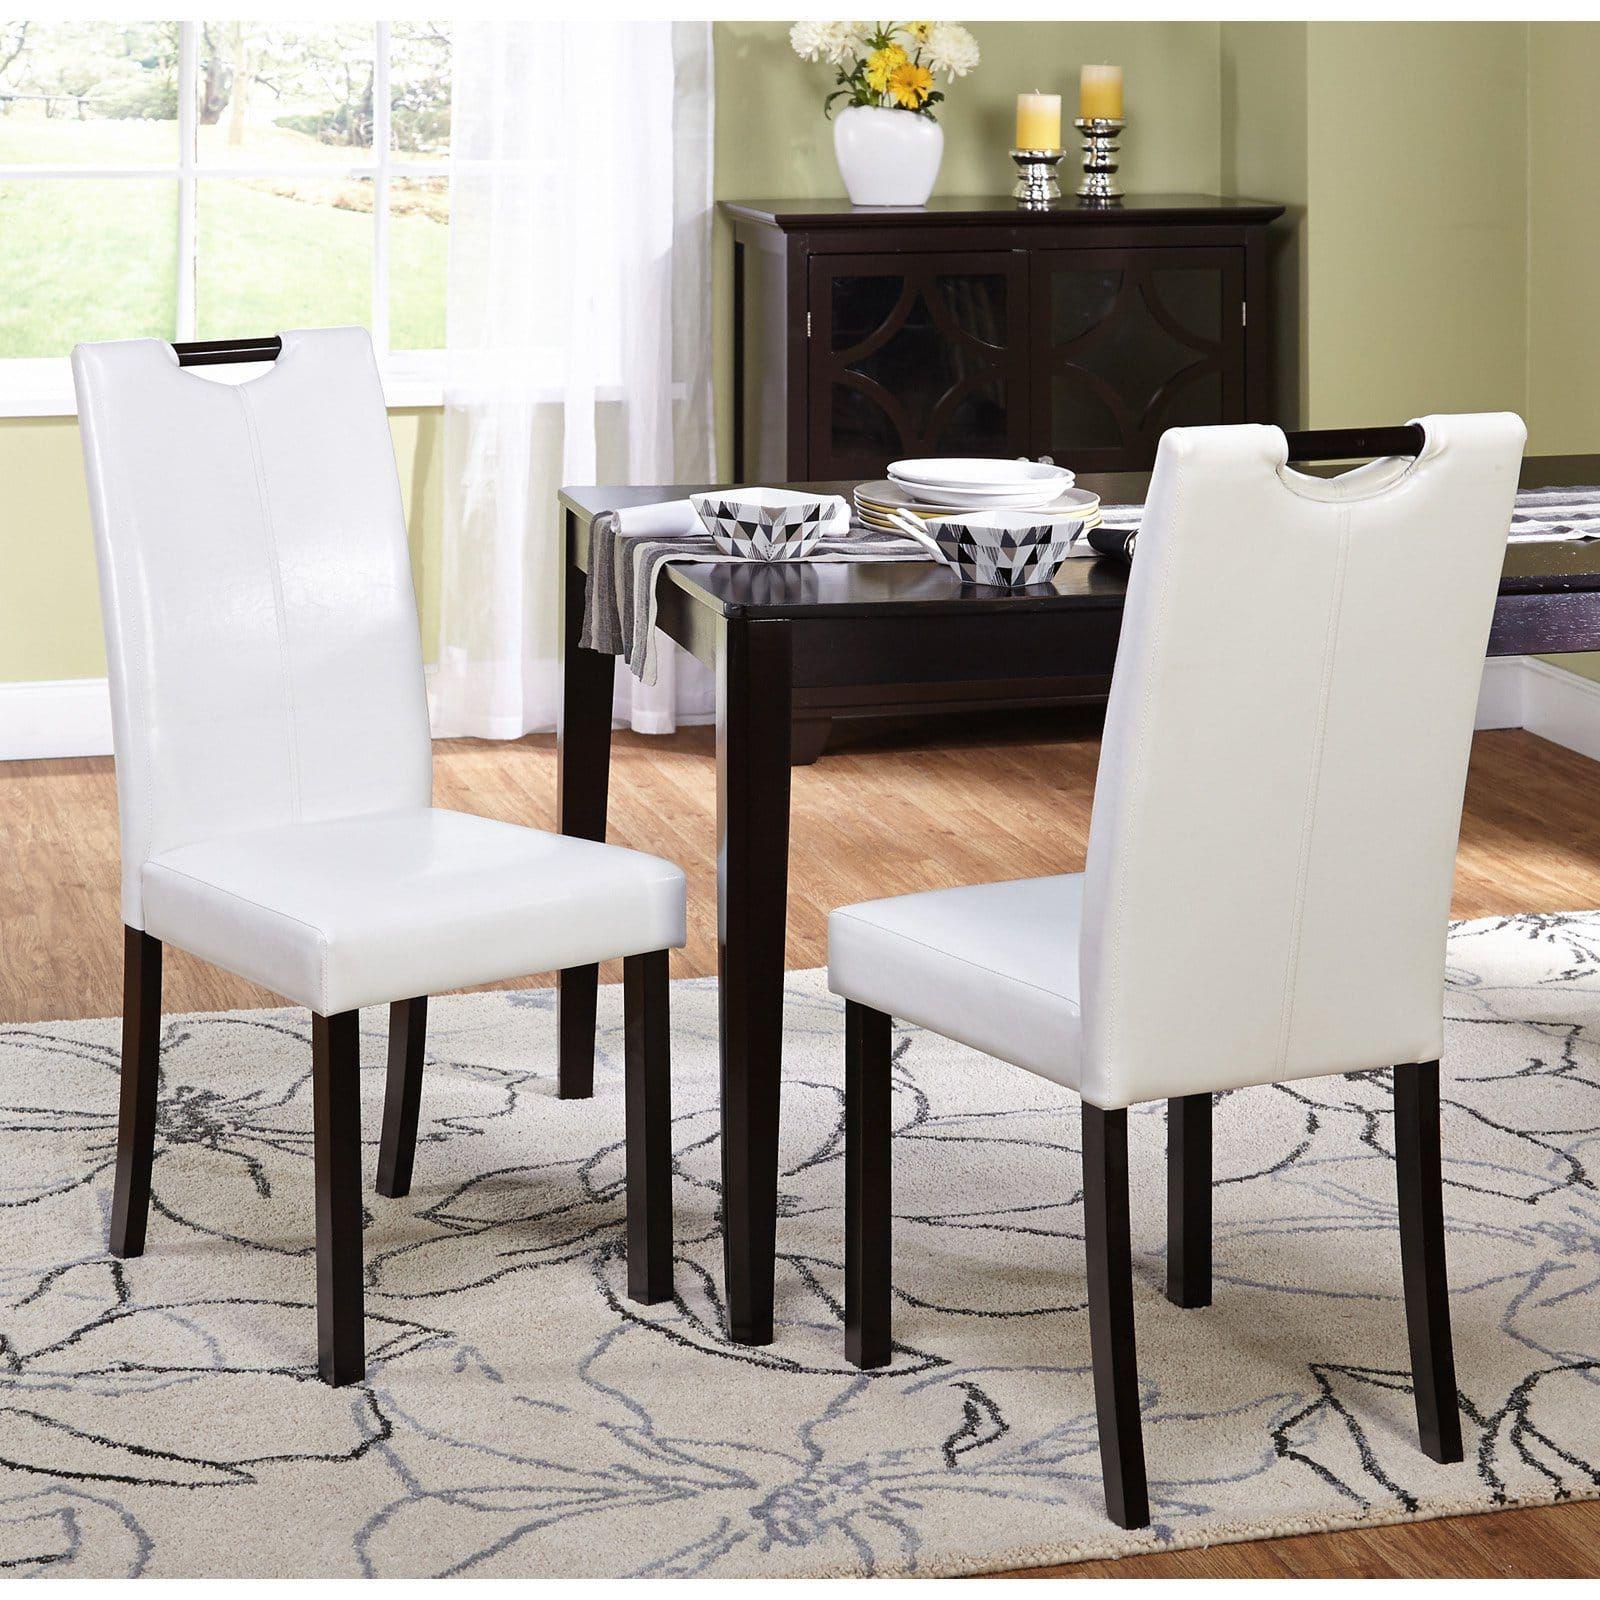 Best Target Dining Chairs Dining Chairs Dining Chair Set Sleek Dining Chair